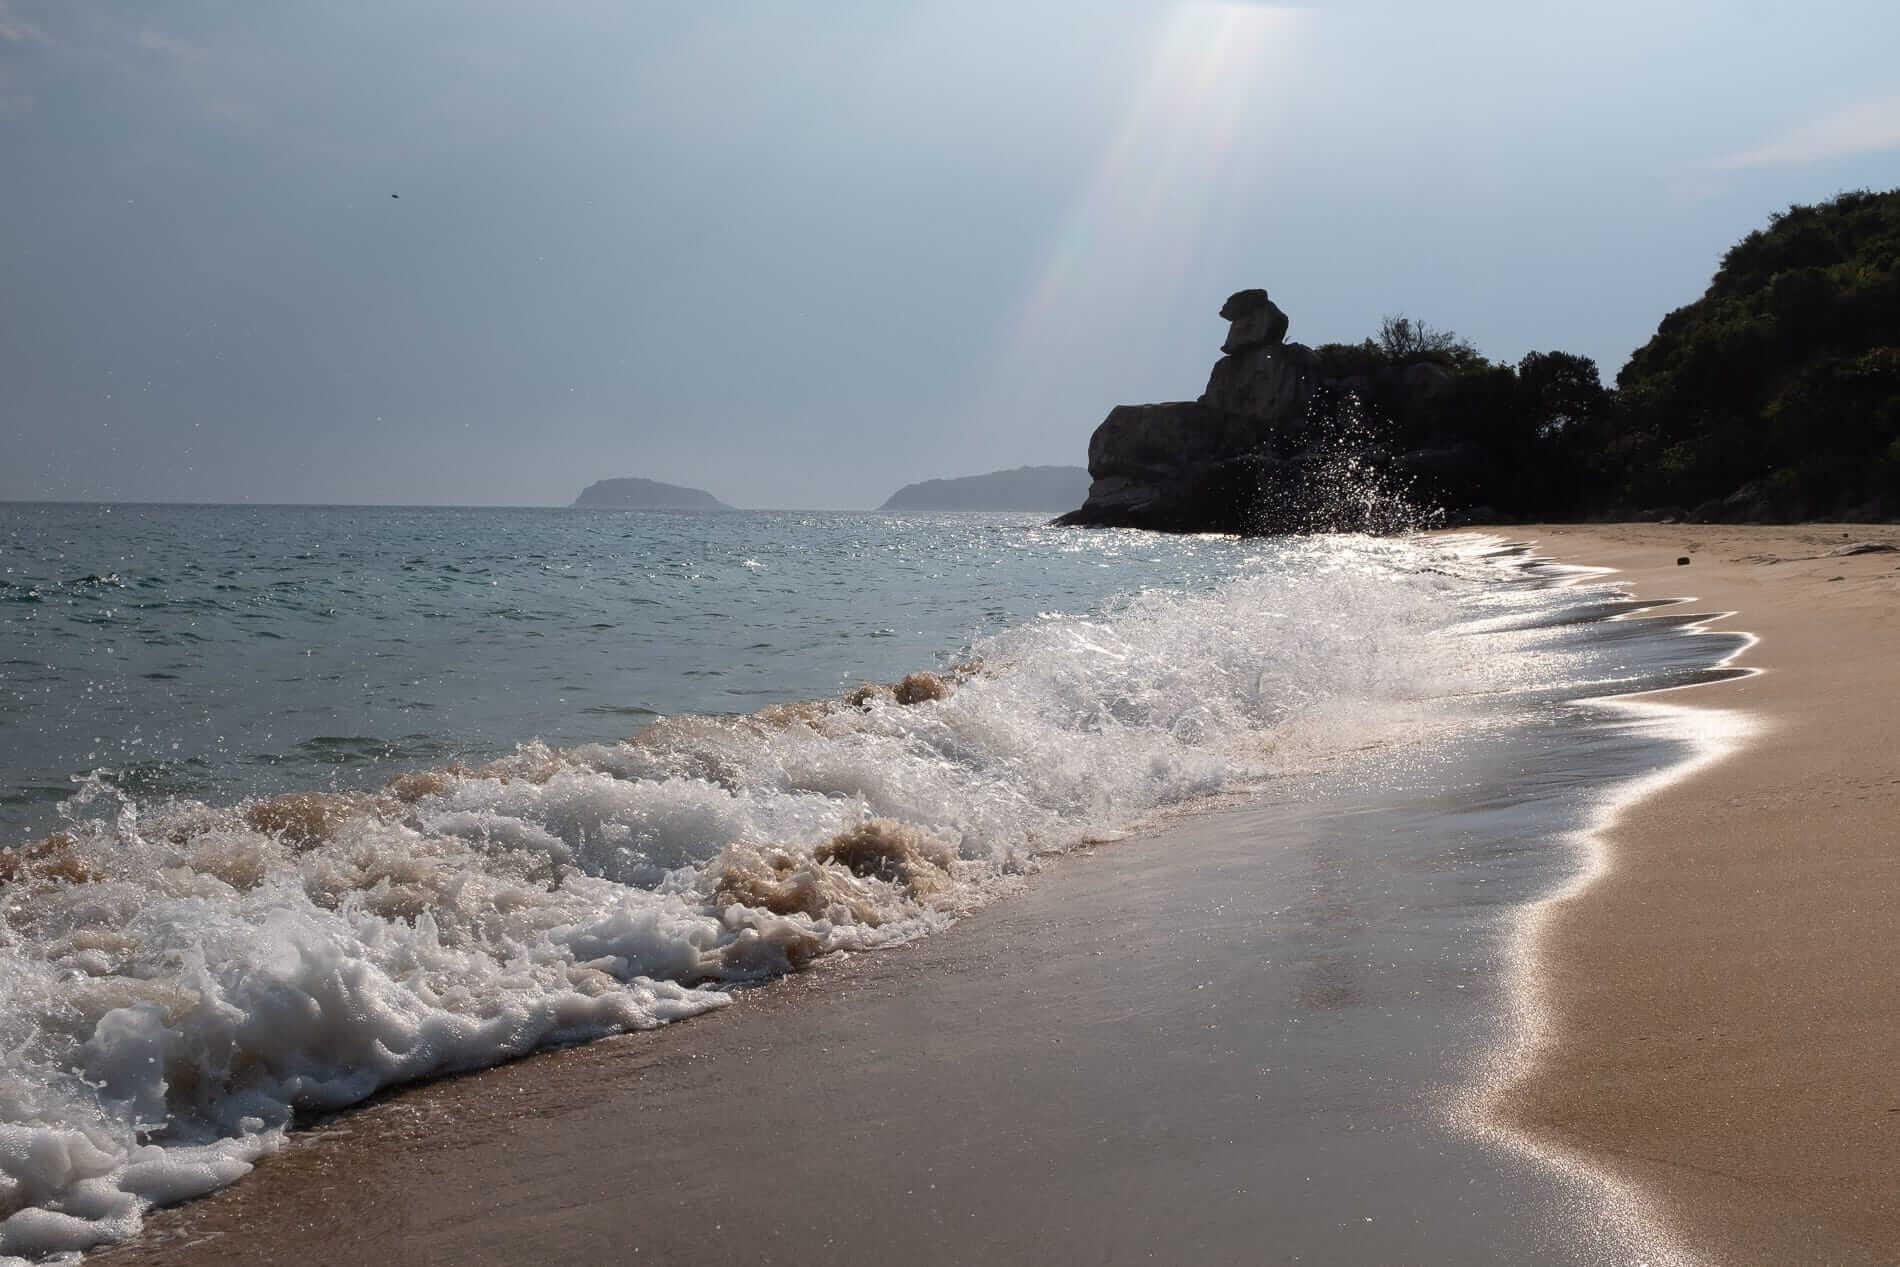 A deserted beach - Cham Island Accommodation